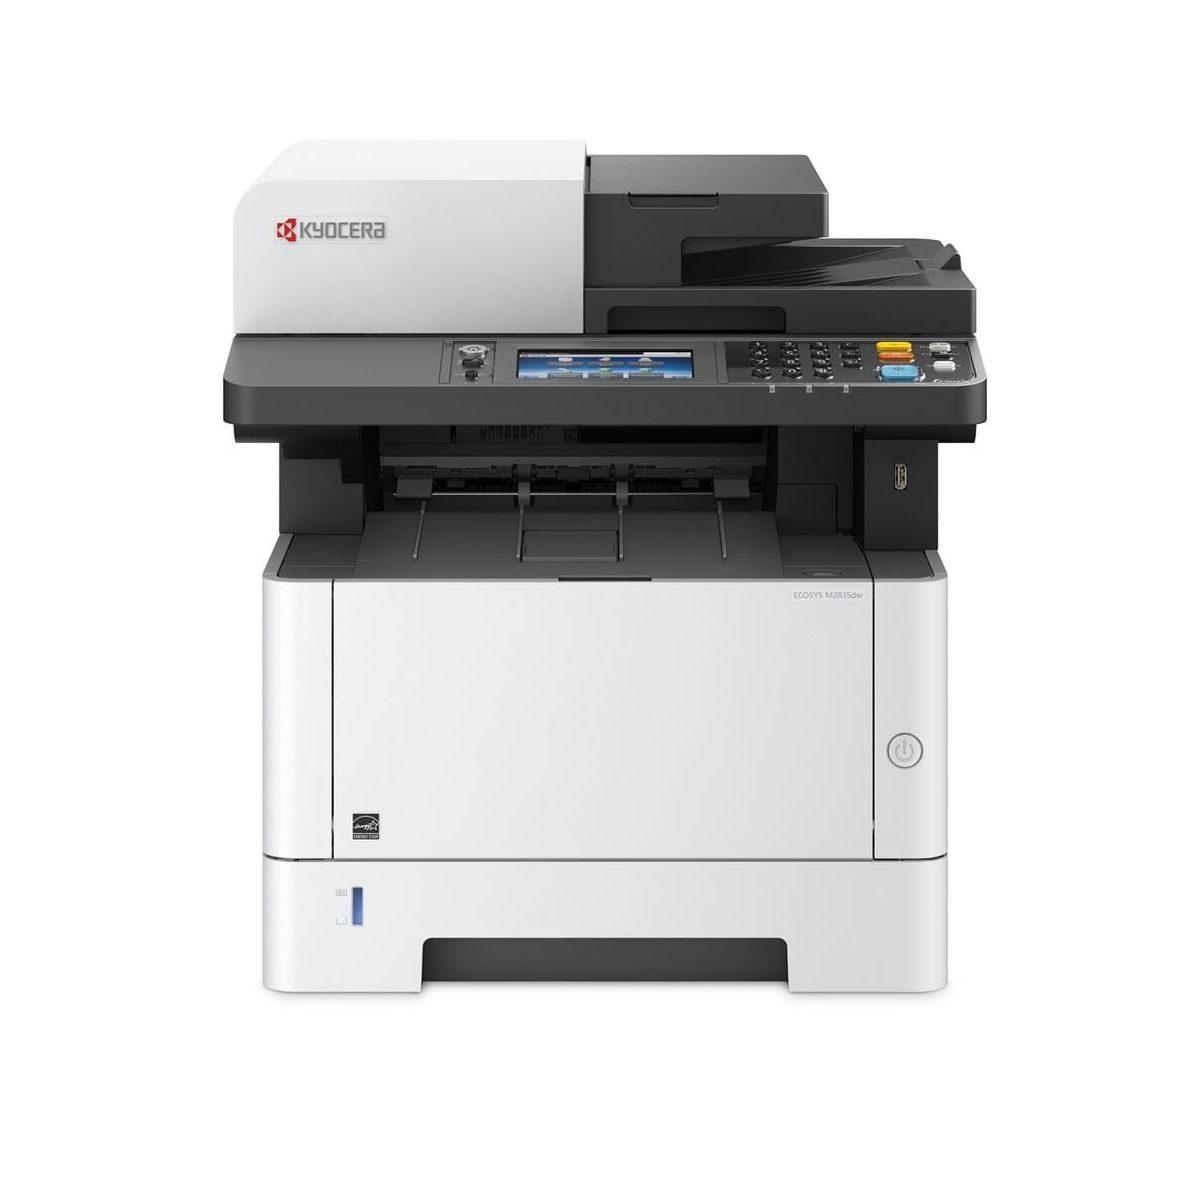 МФУ Принтер Kyocera M2835dw (А4, 35 ppm, 1200dpi, 512Mb, USB, Network, Wi-Fi, touch panel, автоподатчик, тонер